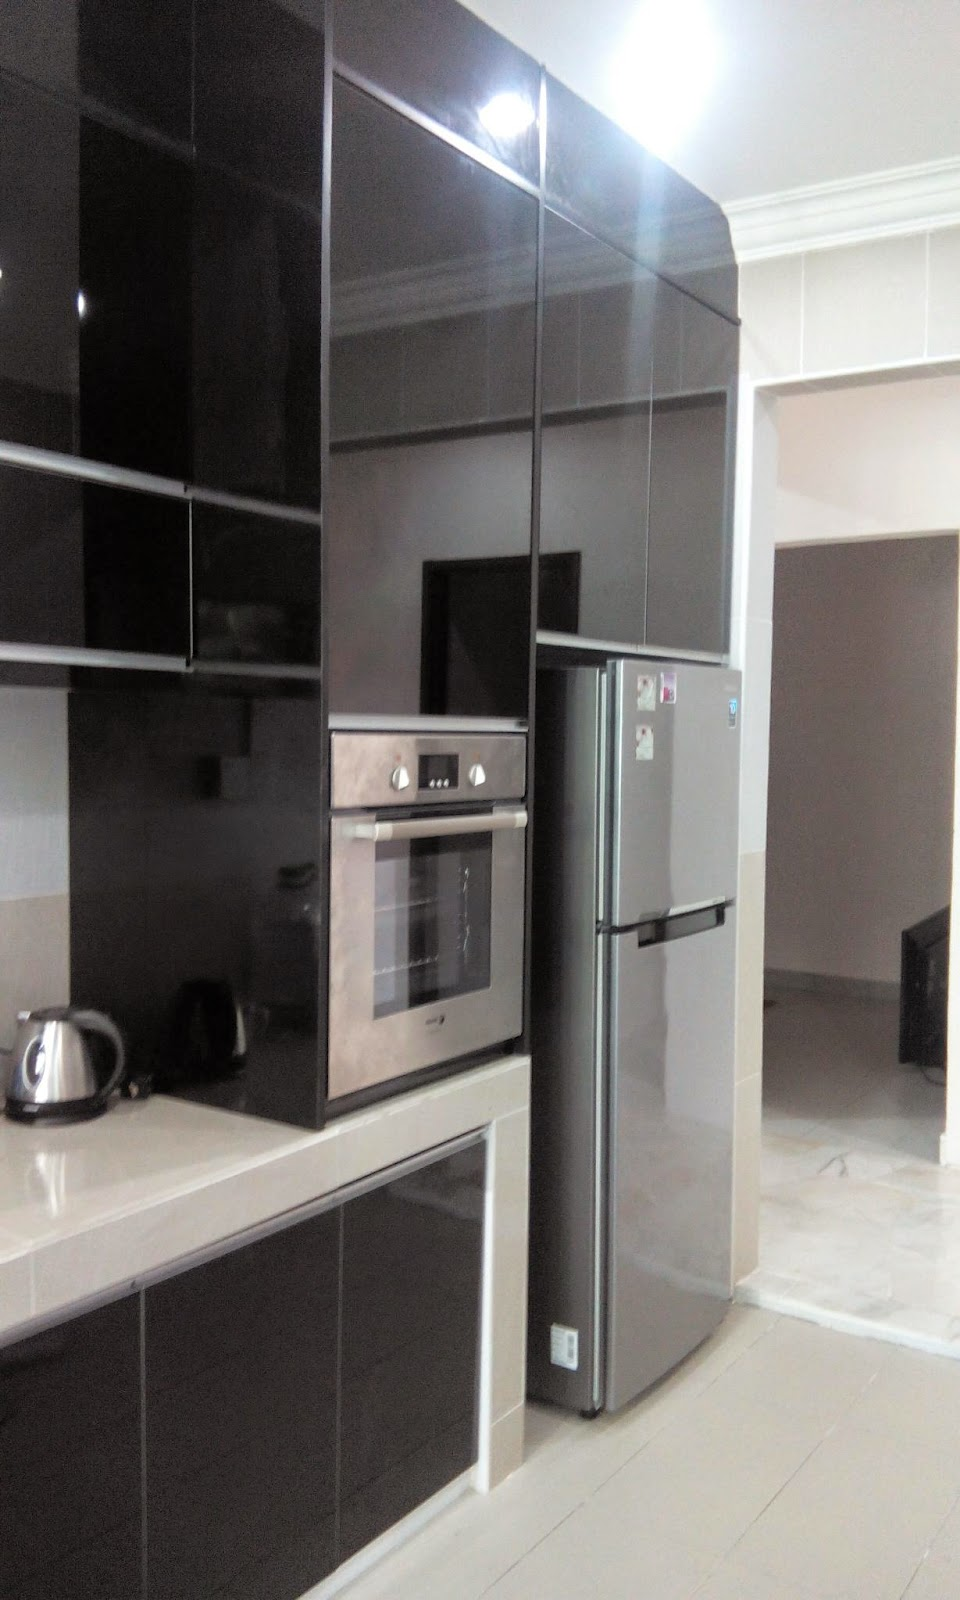 Kabinet dapur terus dari kilang kabinet dapur 4g glass for Kitchen cabinets 4g